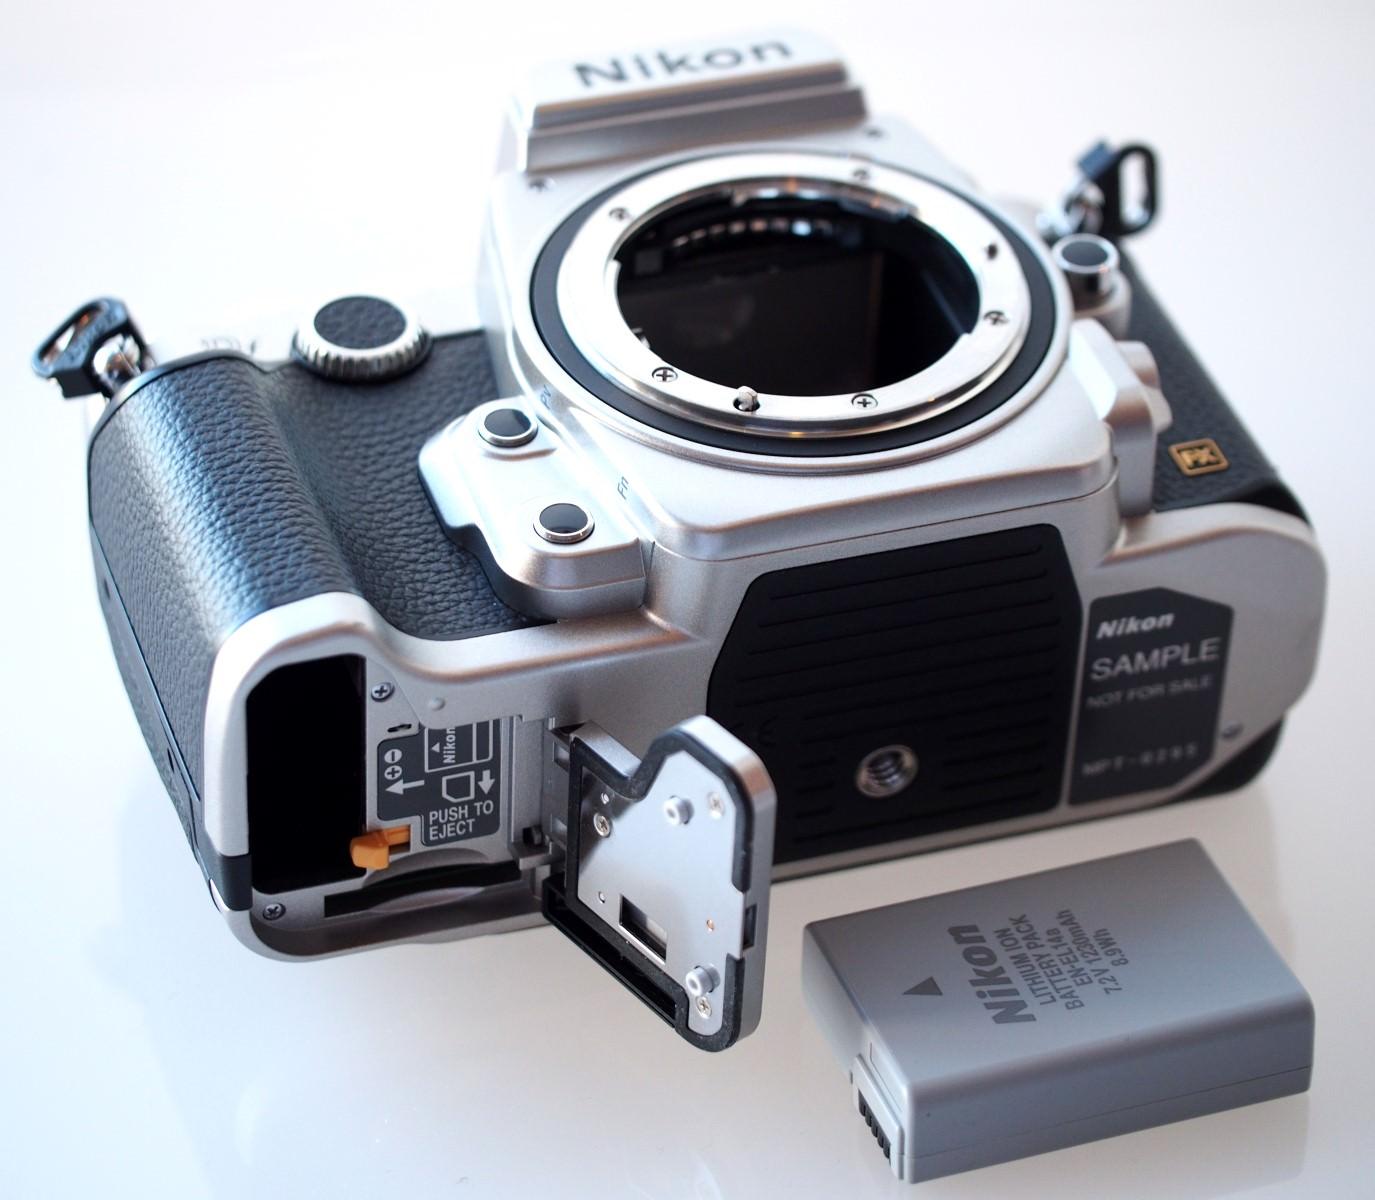 how to put music on nikon camera